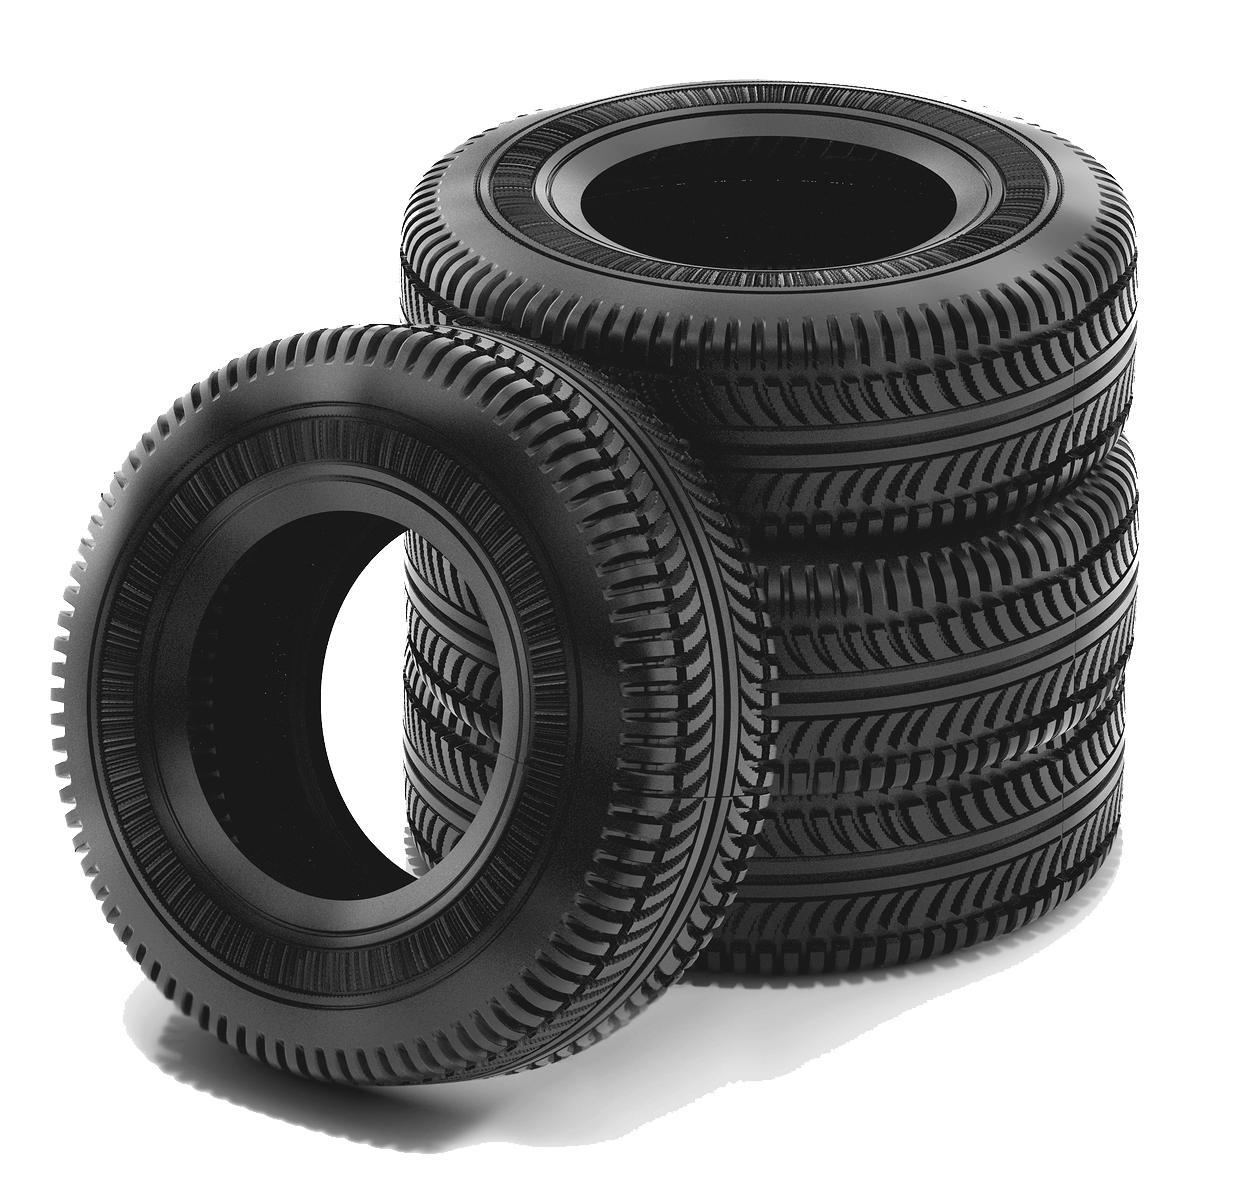 Best Tires For Street Riding Kawasaki Zxr